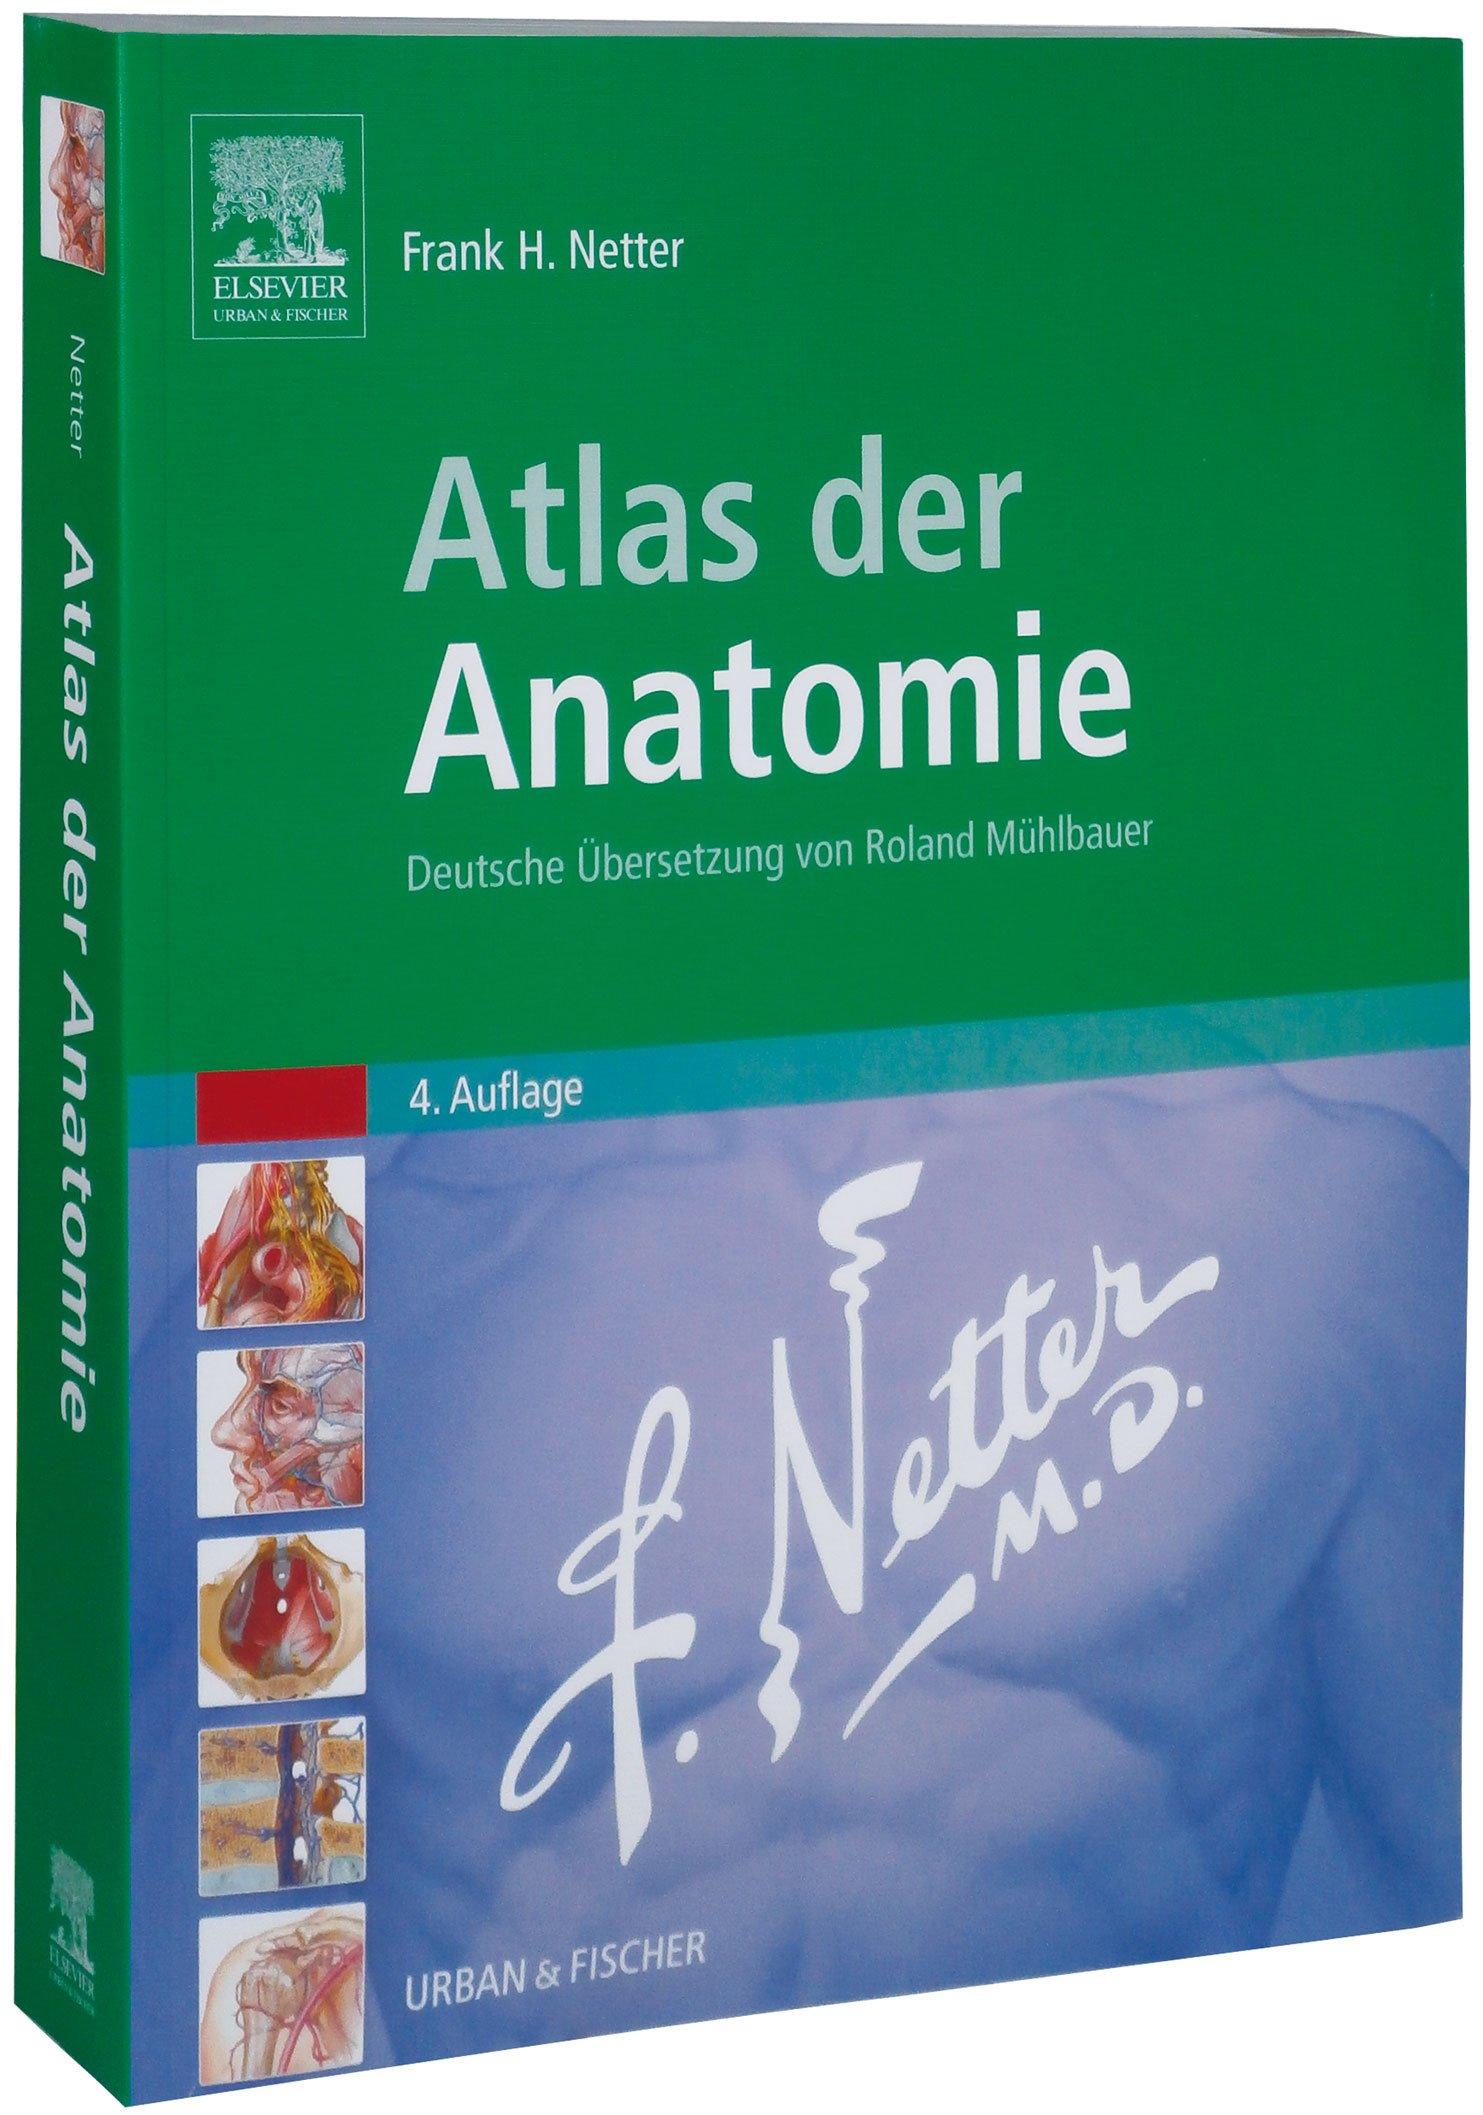 Netter - Atlas der Anatomie: Amazon.de: Frank H. Netter: Bücher